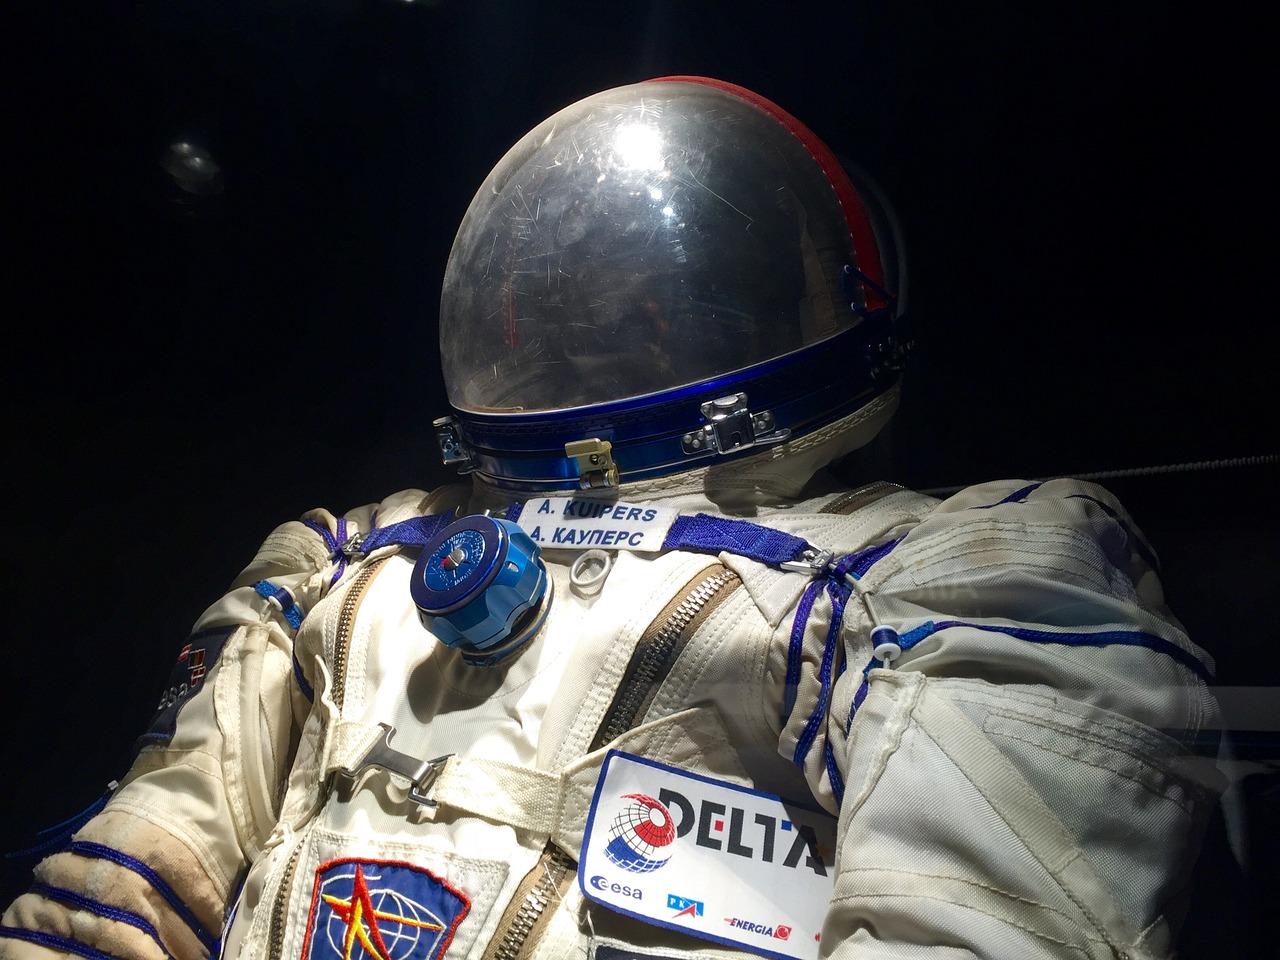 Le costume d'un astronaute